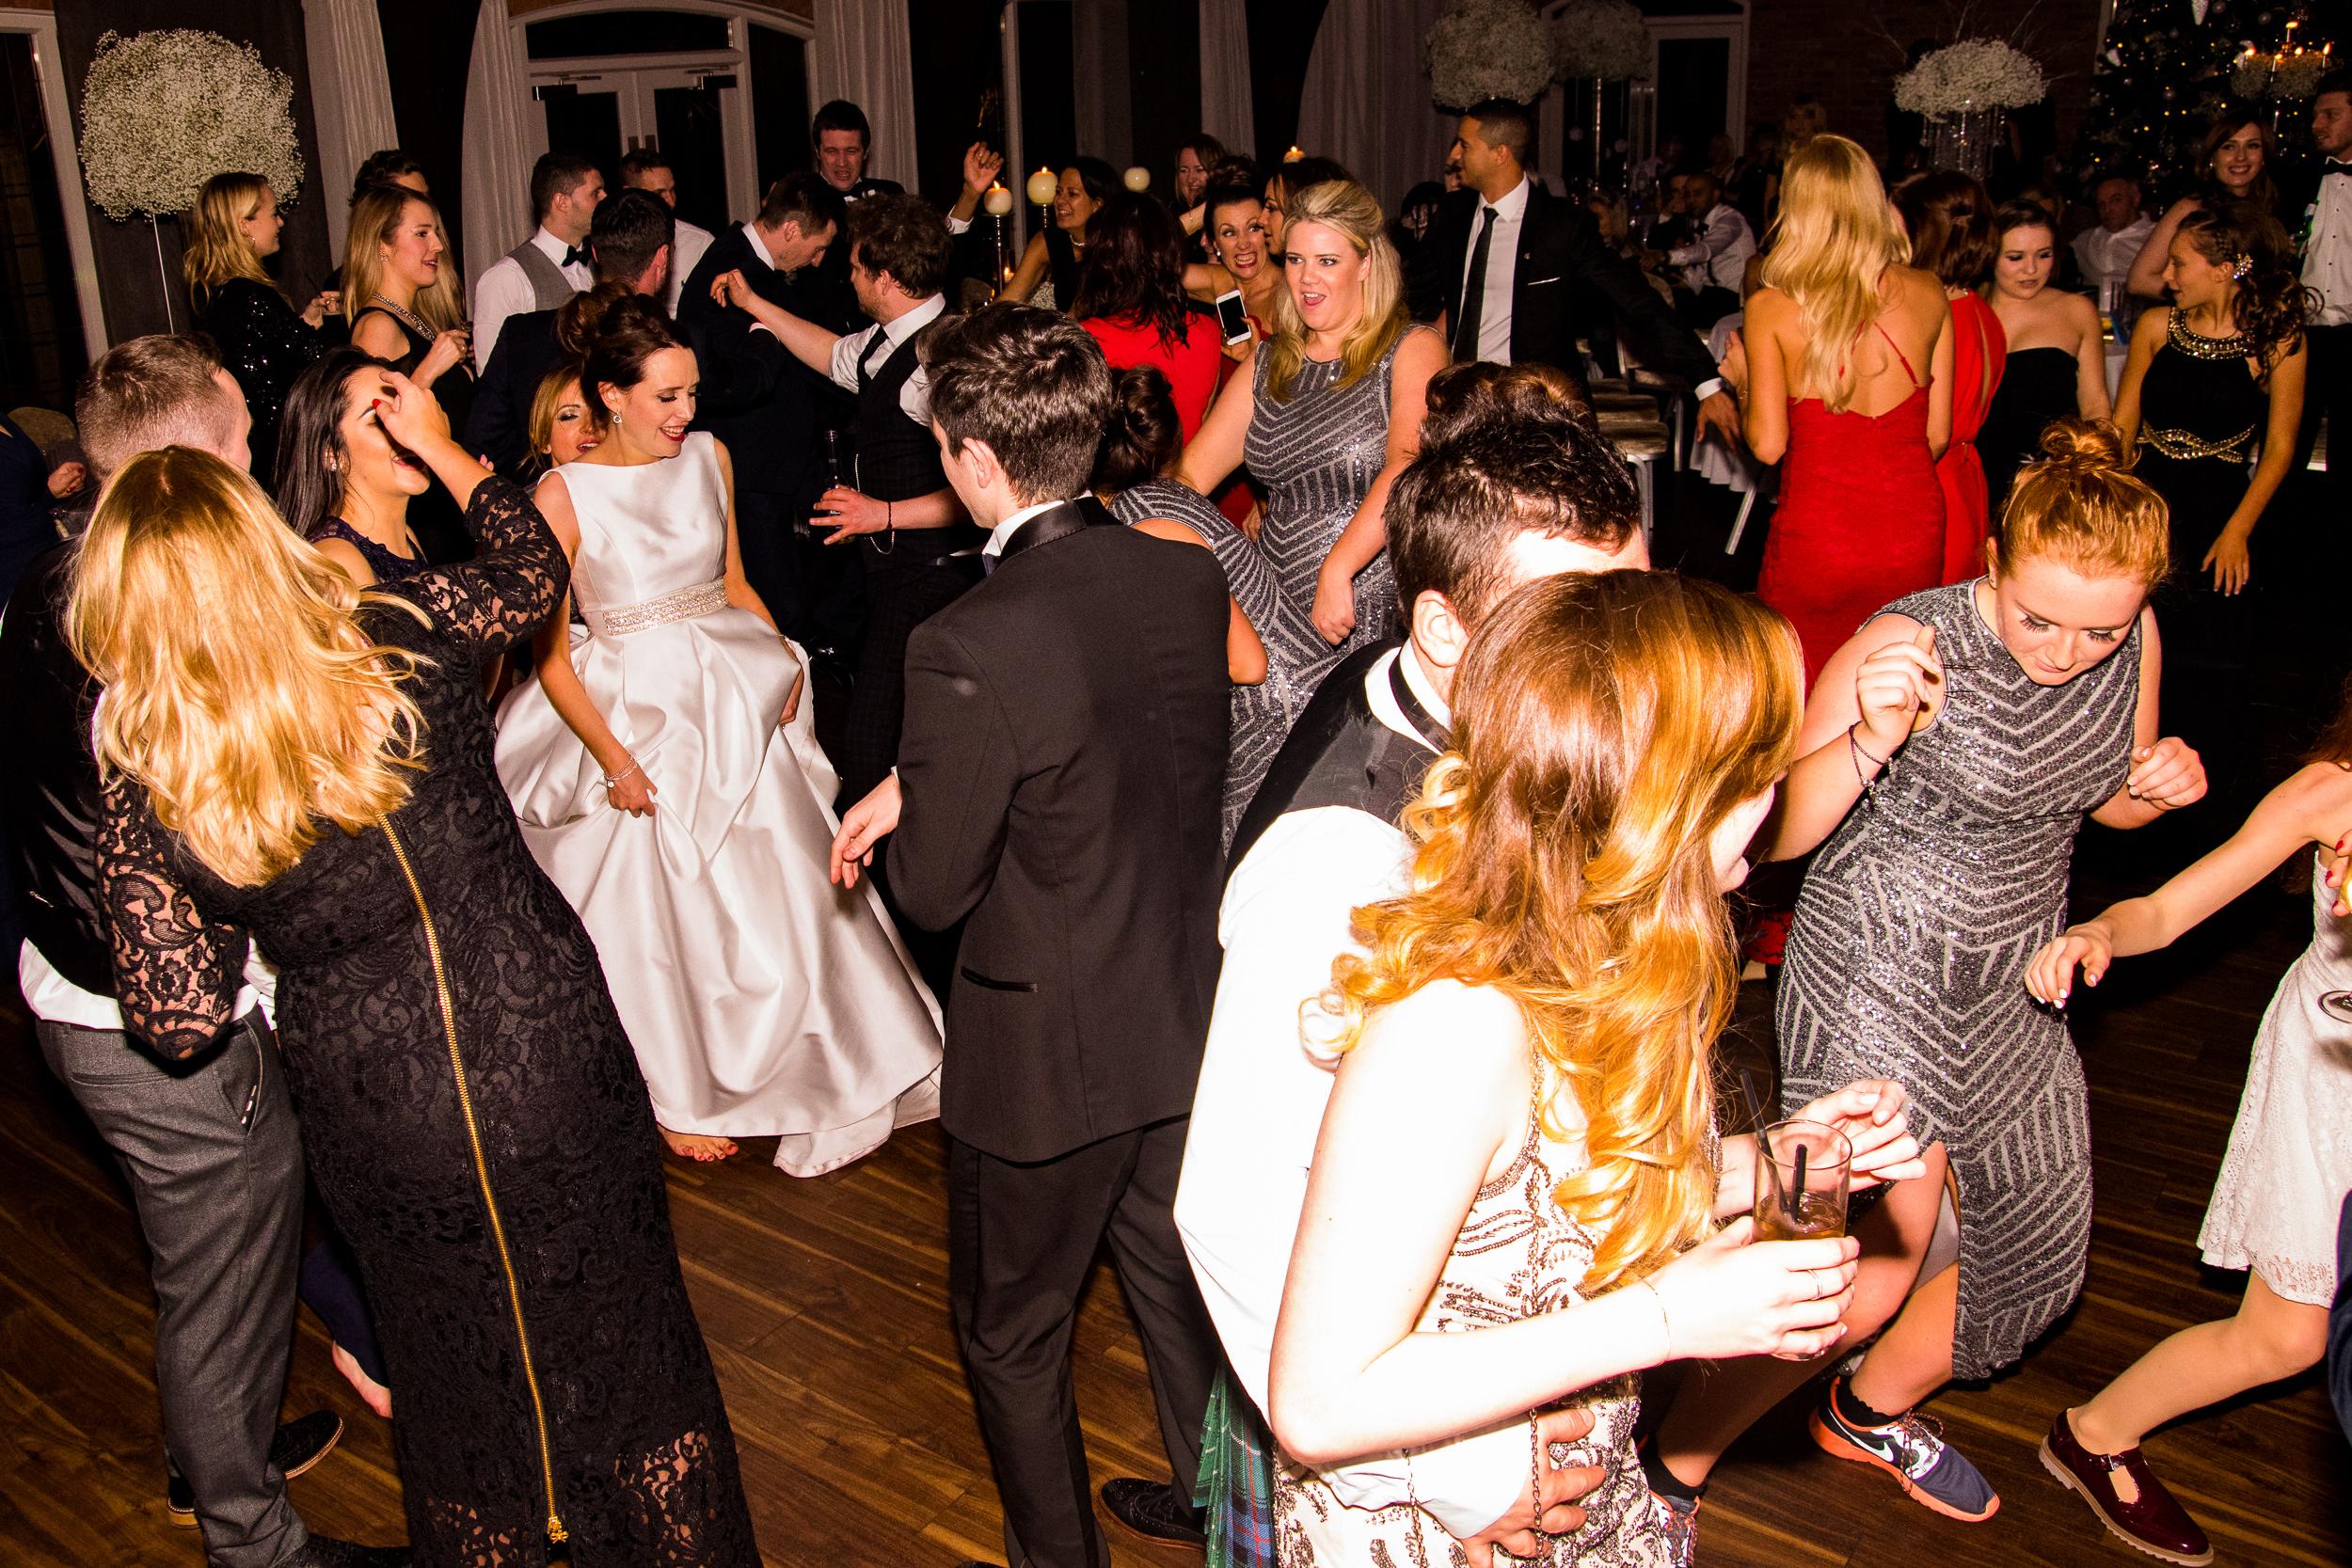 SPARKLY BRIDESMAID DRESSES ON THE COLSHAW HALL DANCEFLOOR. WEDDING DJ ADAM CARR PLAYING THE SONGS.